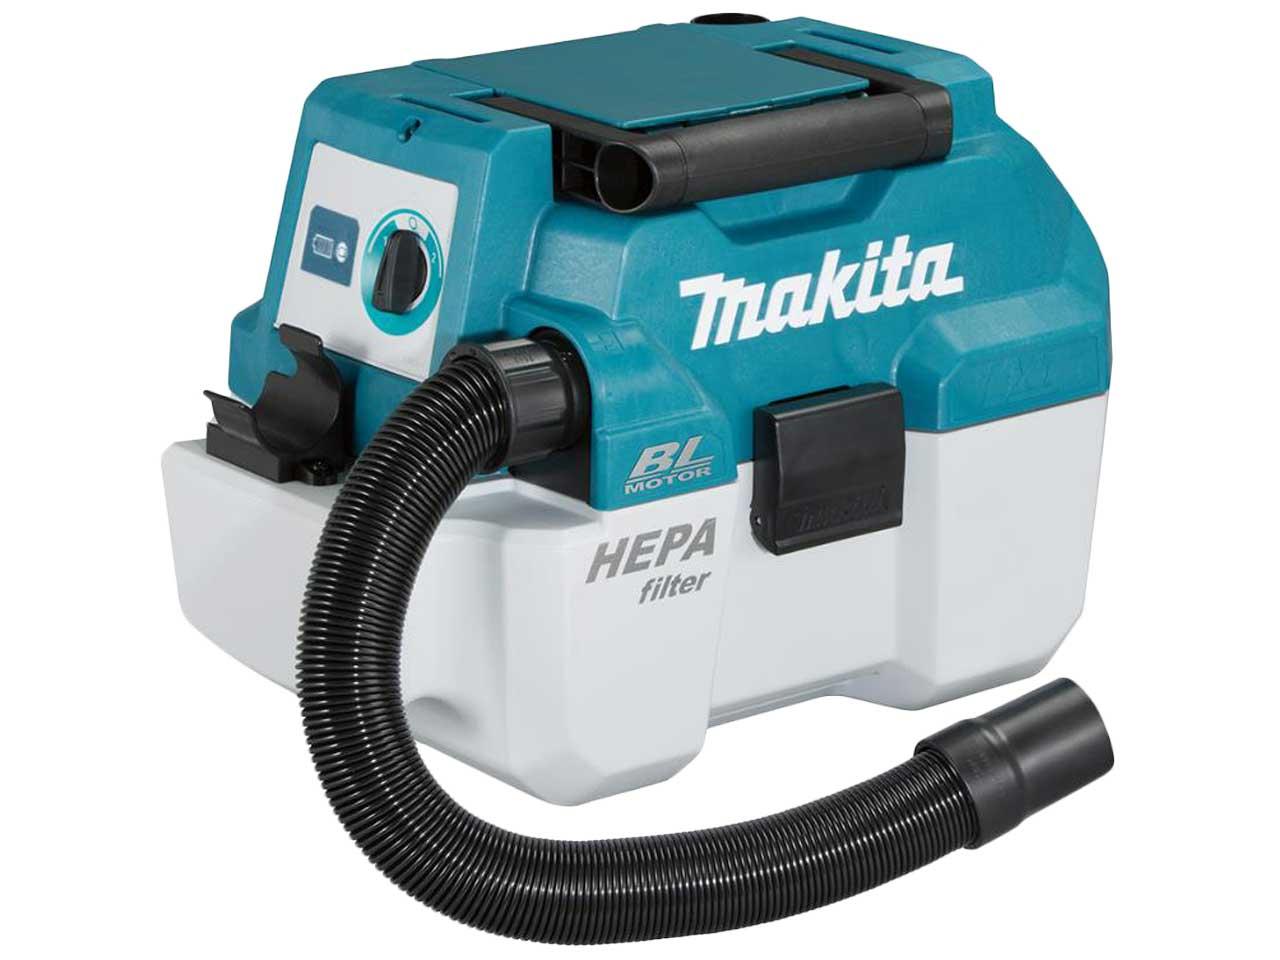 Makita DVC750LZ 18V LXT BL L Class Vacuum Cleaner Bare Unit £129 at FFX